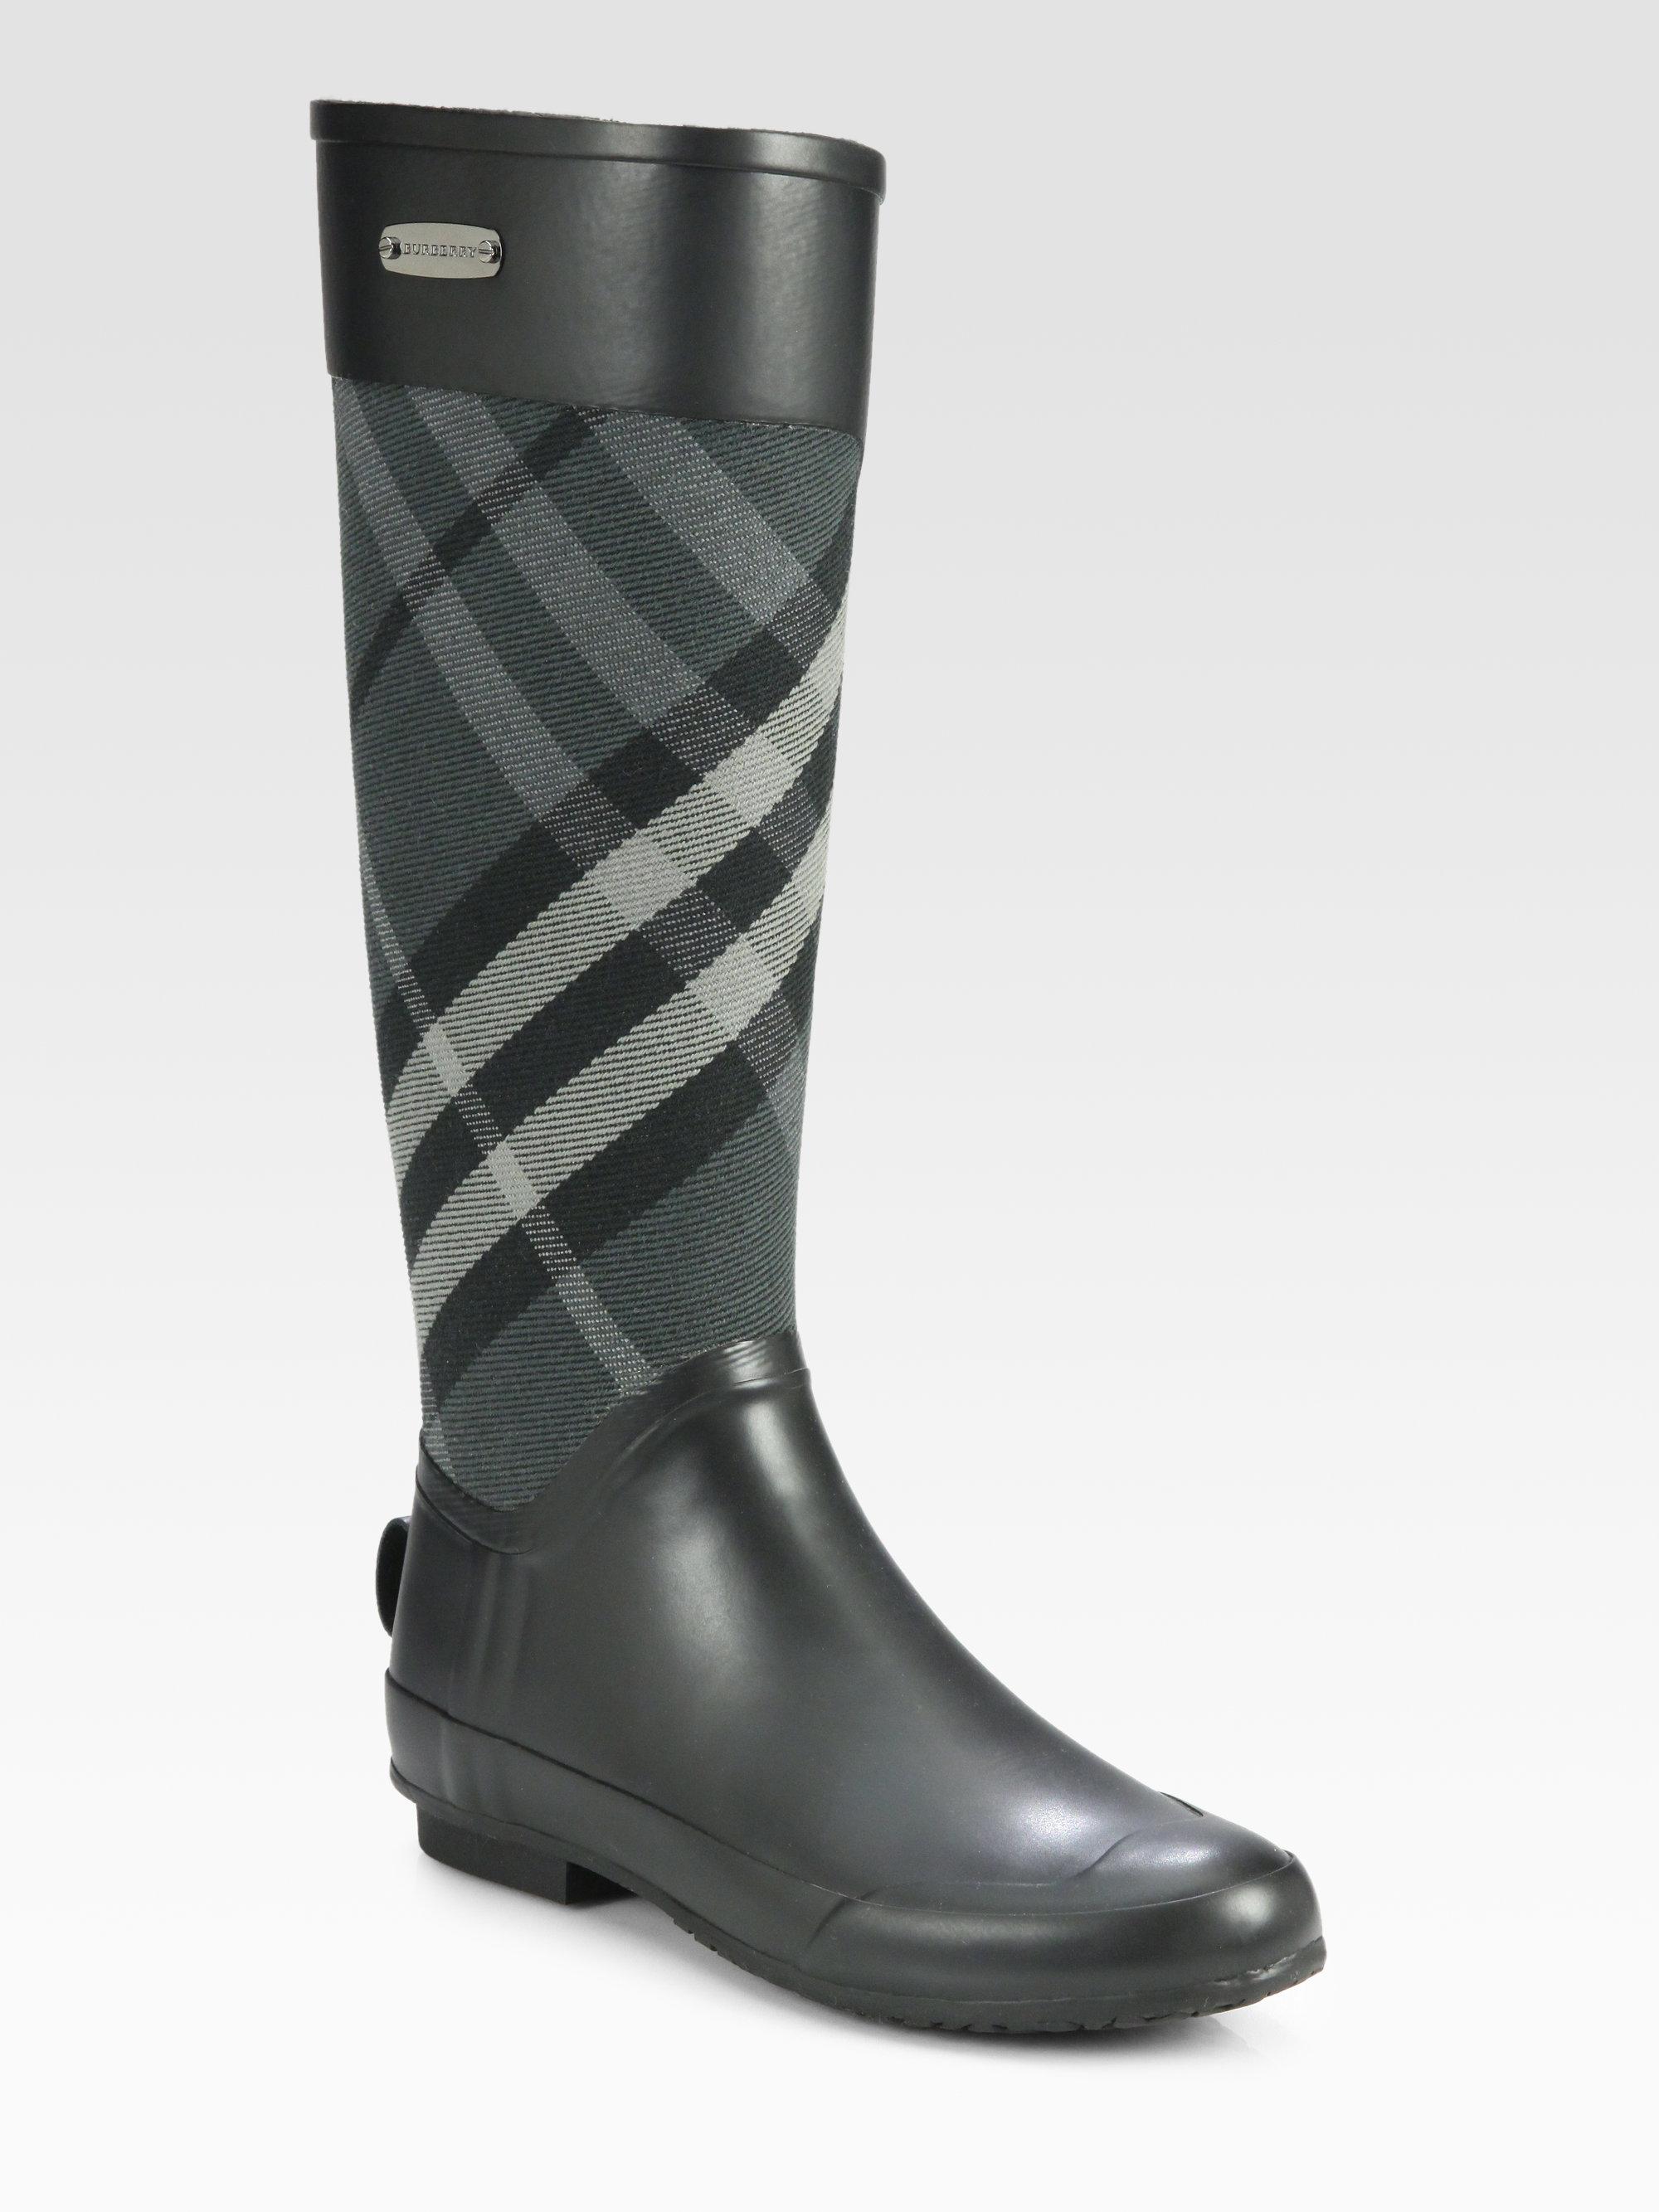 Burberry Women's Clemence Signature Check Rain Boots W39dZM